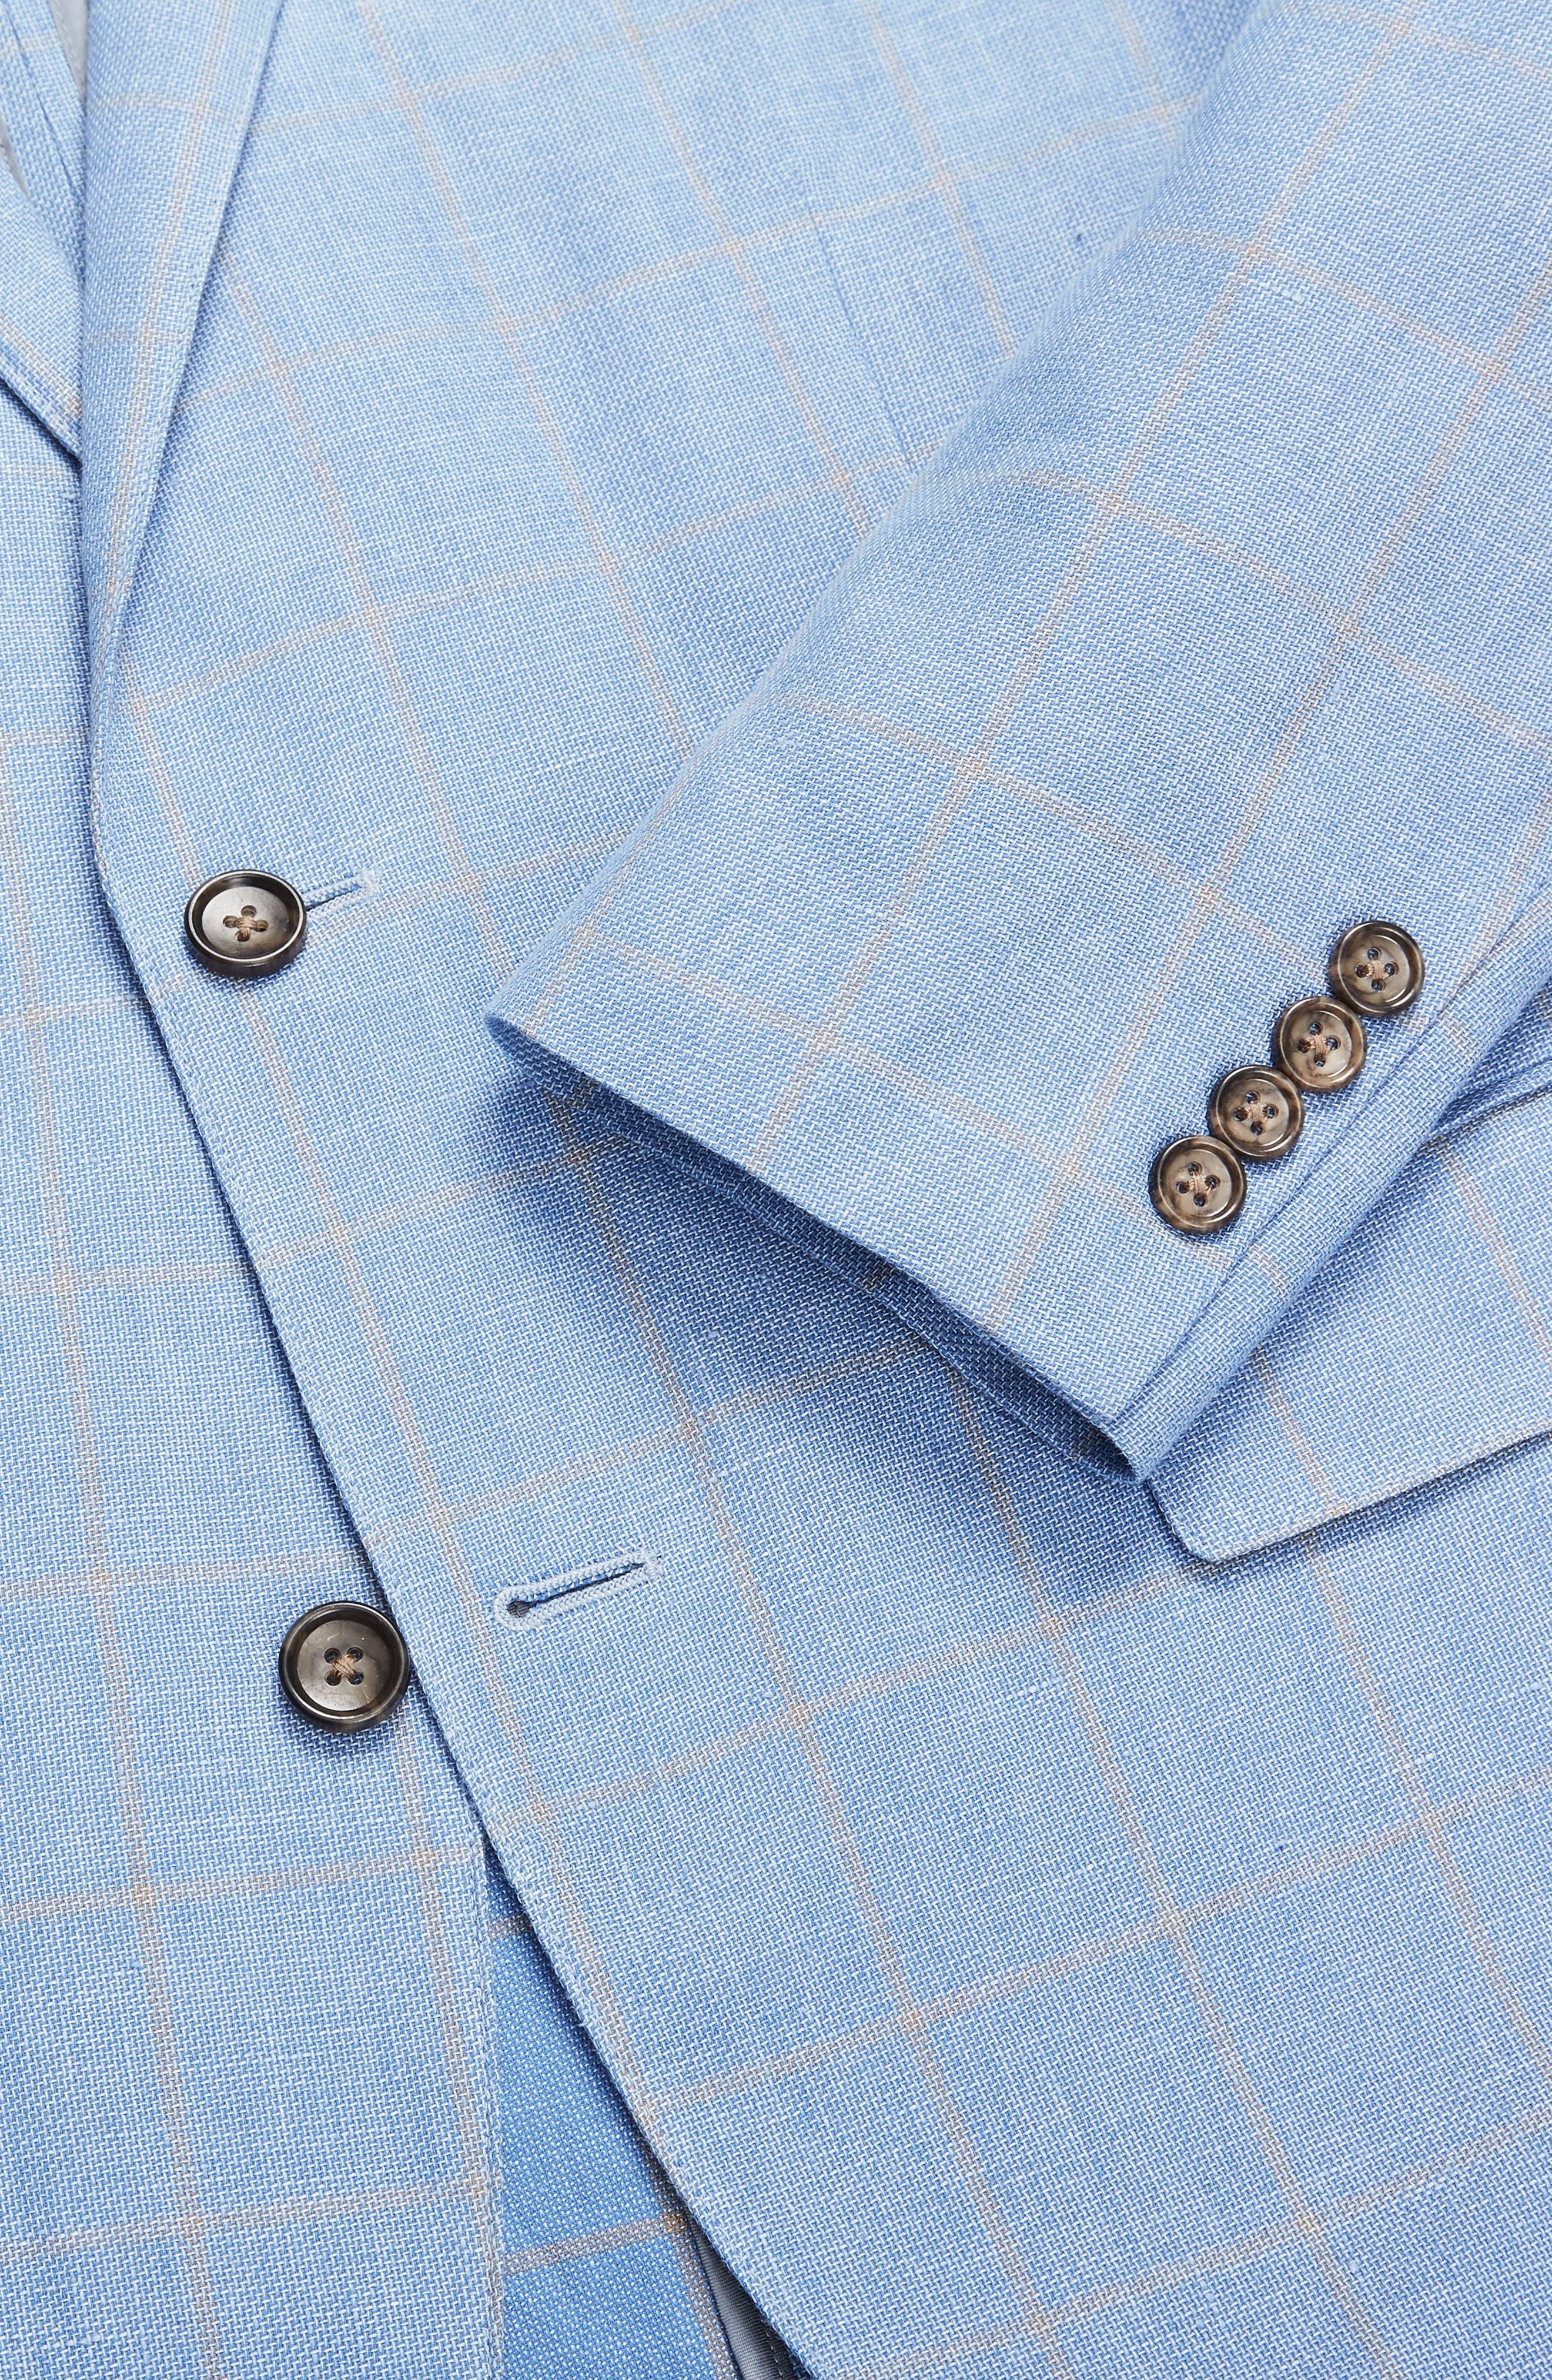 Alternate Image 3  - Bonobos Slim Fit Cotton & Linen Unconstructed Blazer